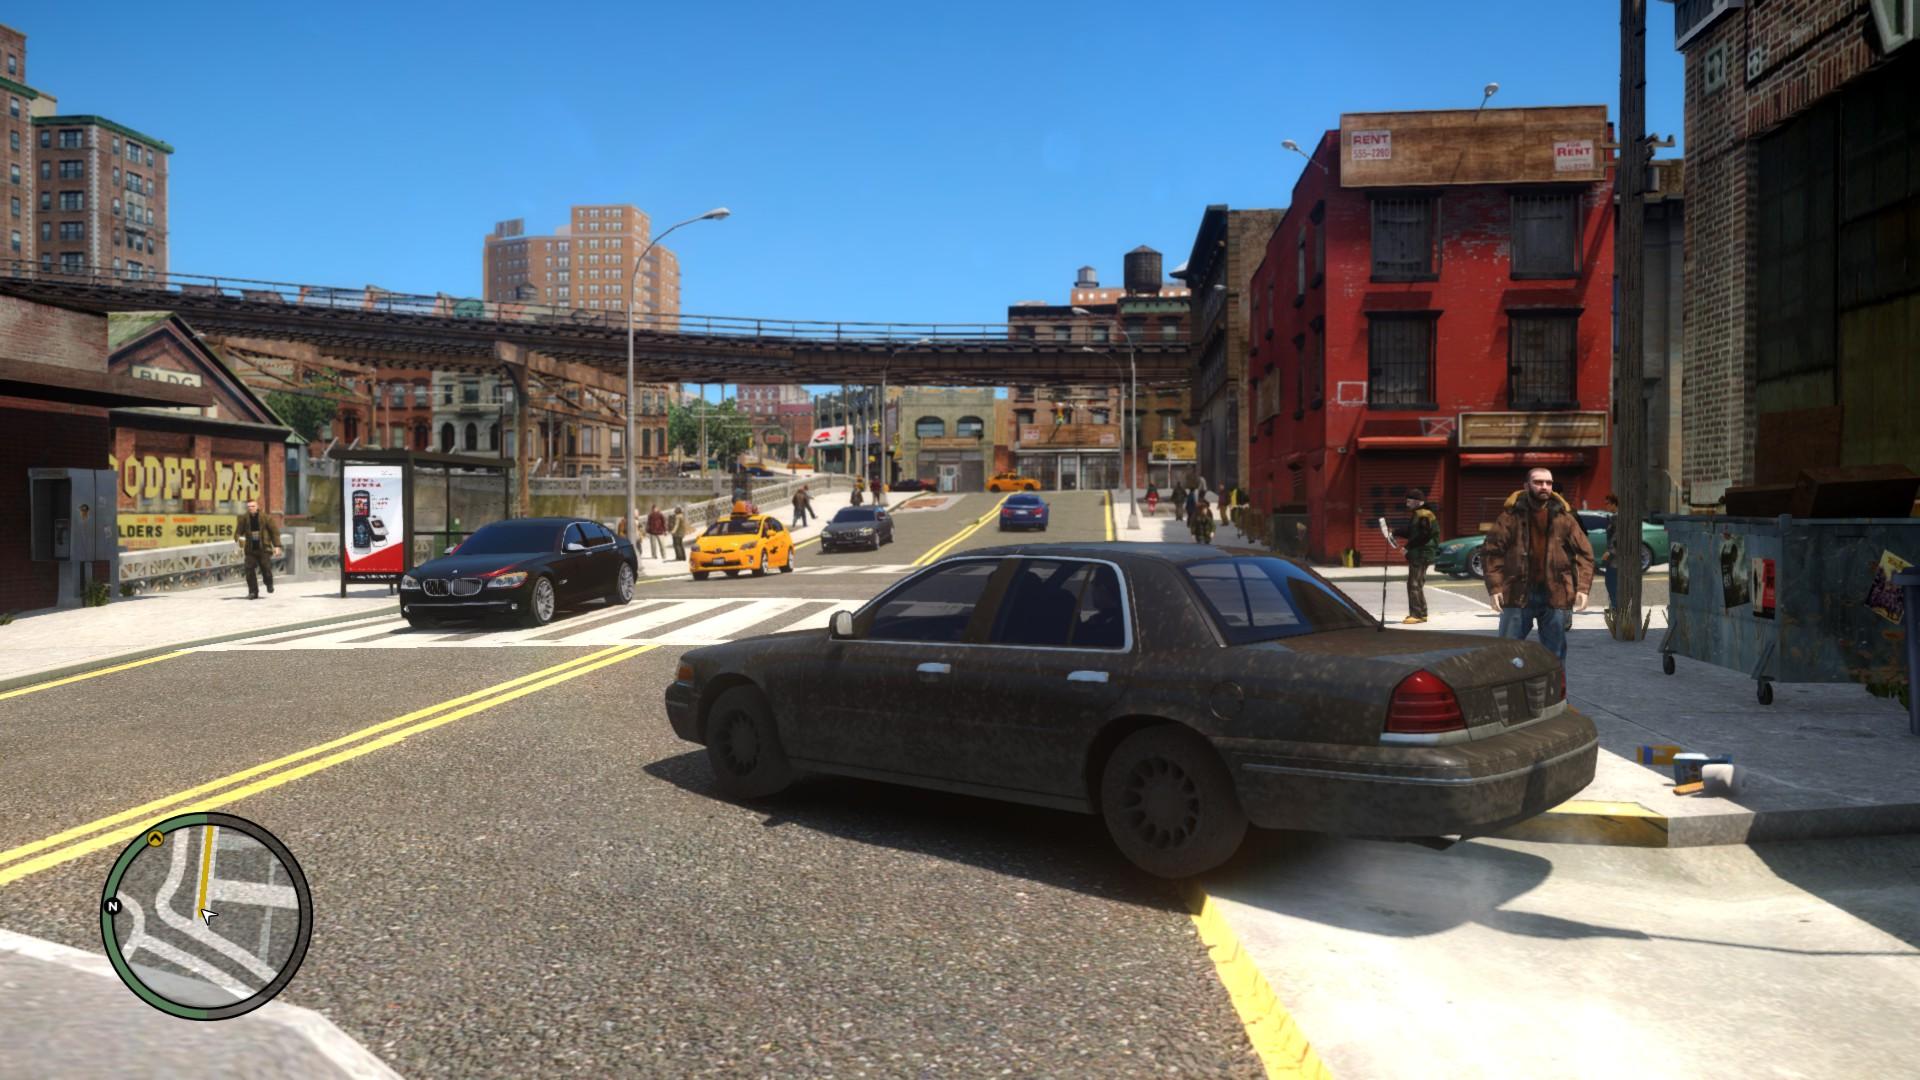 gameplay_screeshot_2 image - GRAND THEFT AUTO IV REDUX mod ...